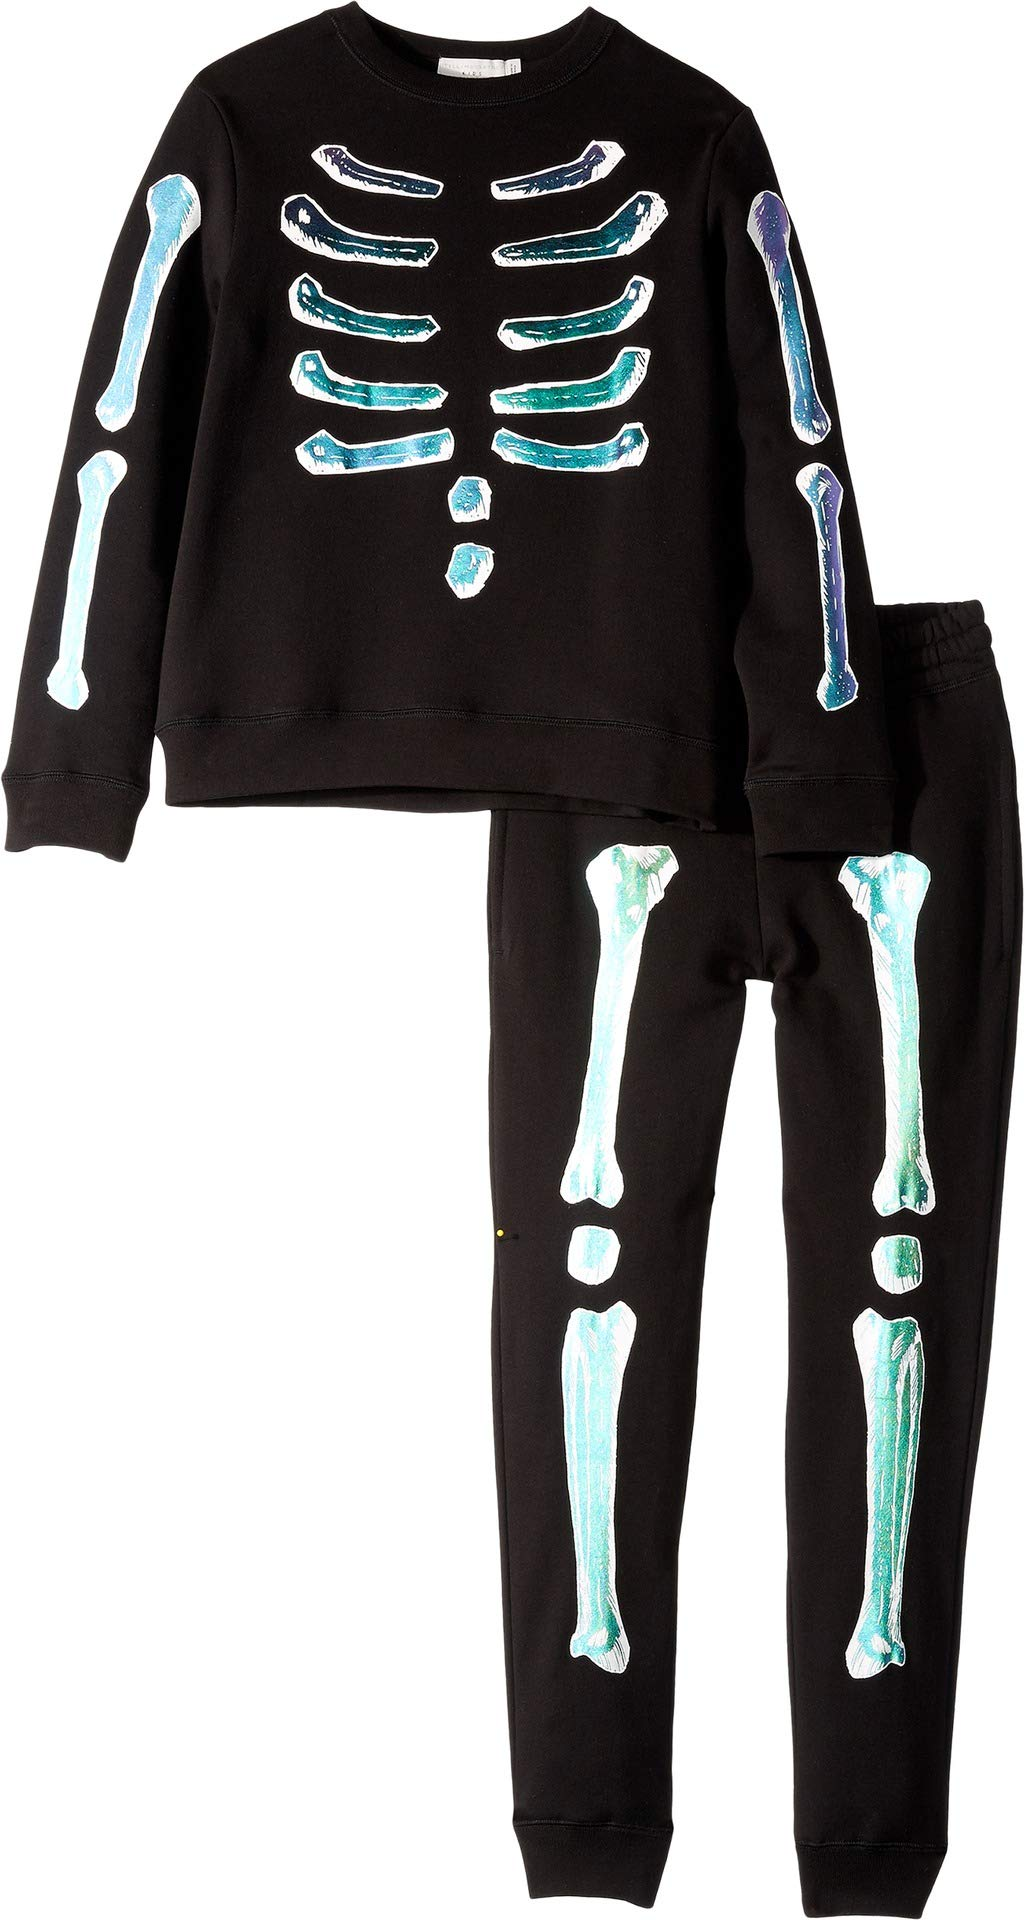 Stella McCartney Kids Baby Boy's Biz + Zachary Holographic Bones Fleece Sweater Jogger Set (Toddler/Little Kids/Big Kids) Black 8